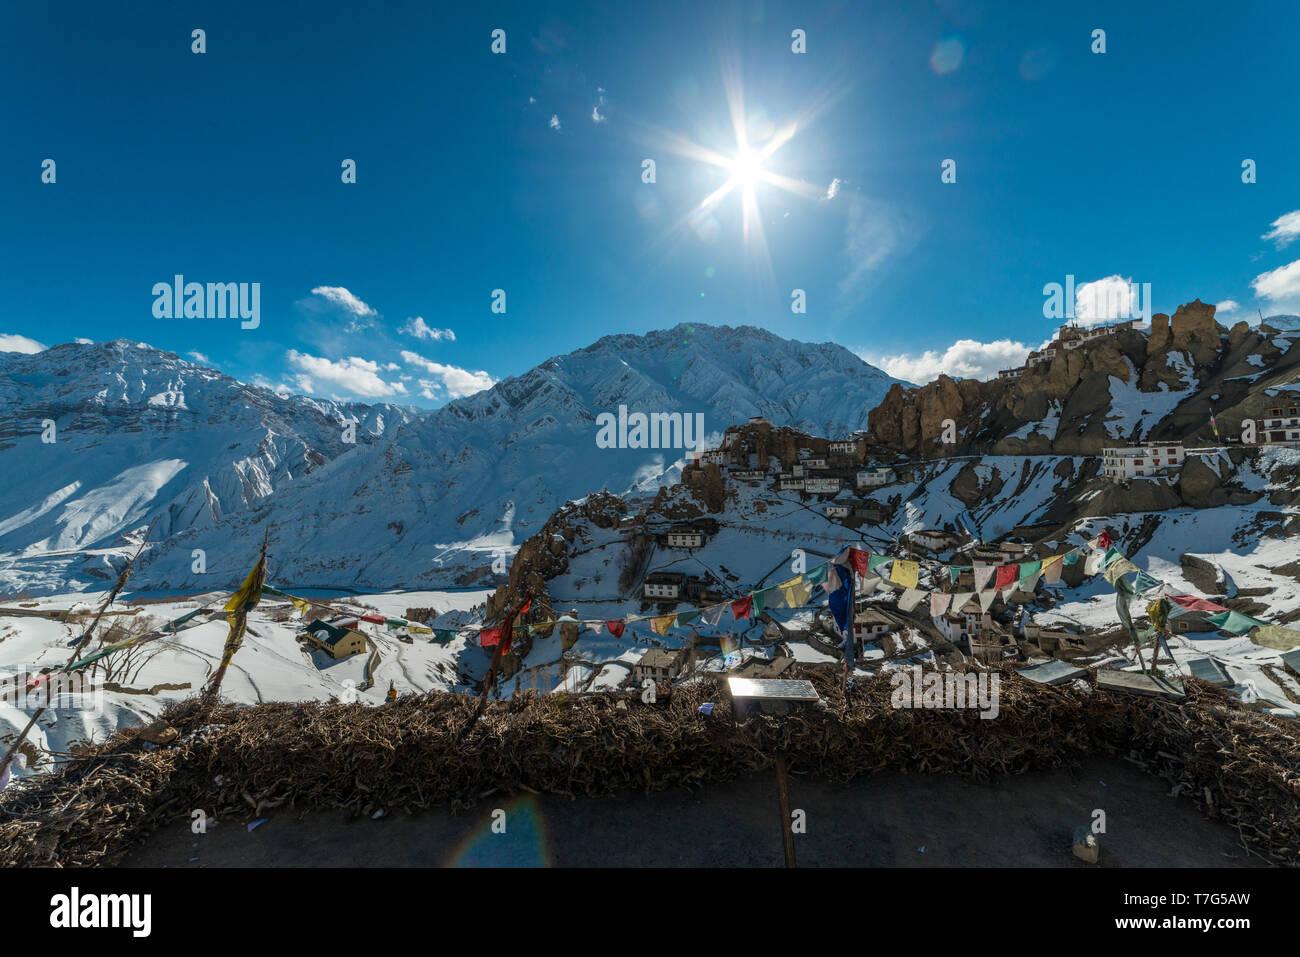 Sunset in Himalayan Village - Sun star burst in mountains - Stock Image